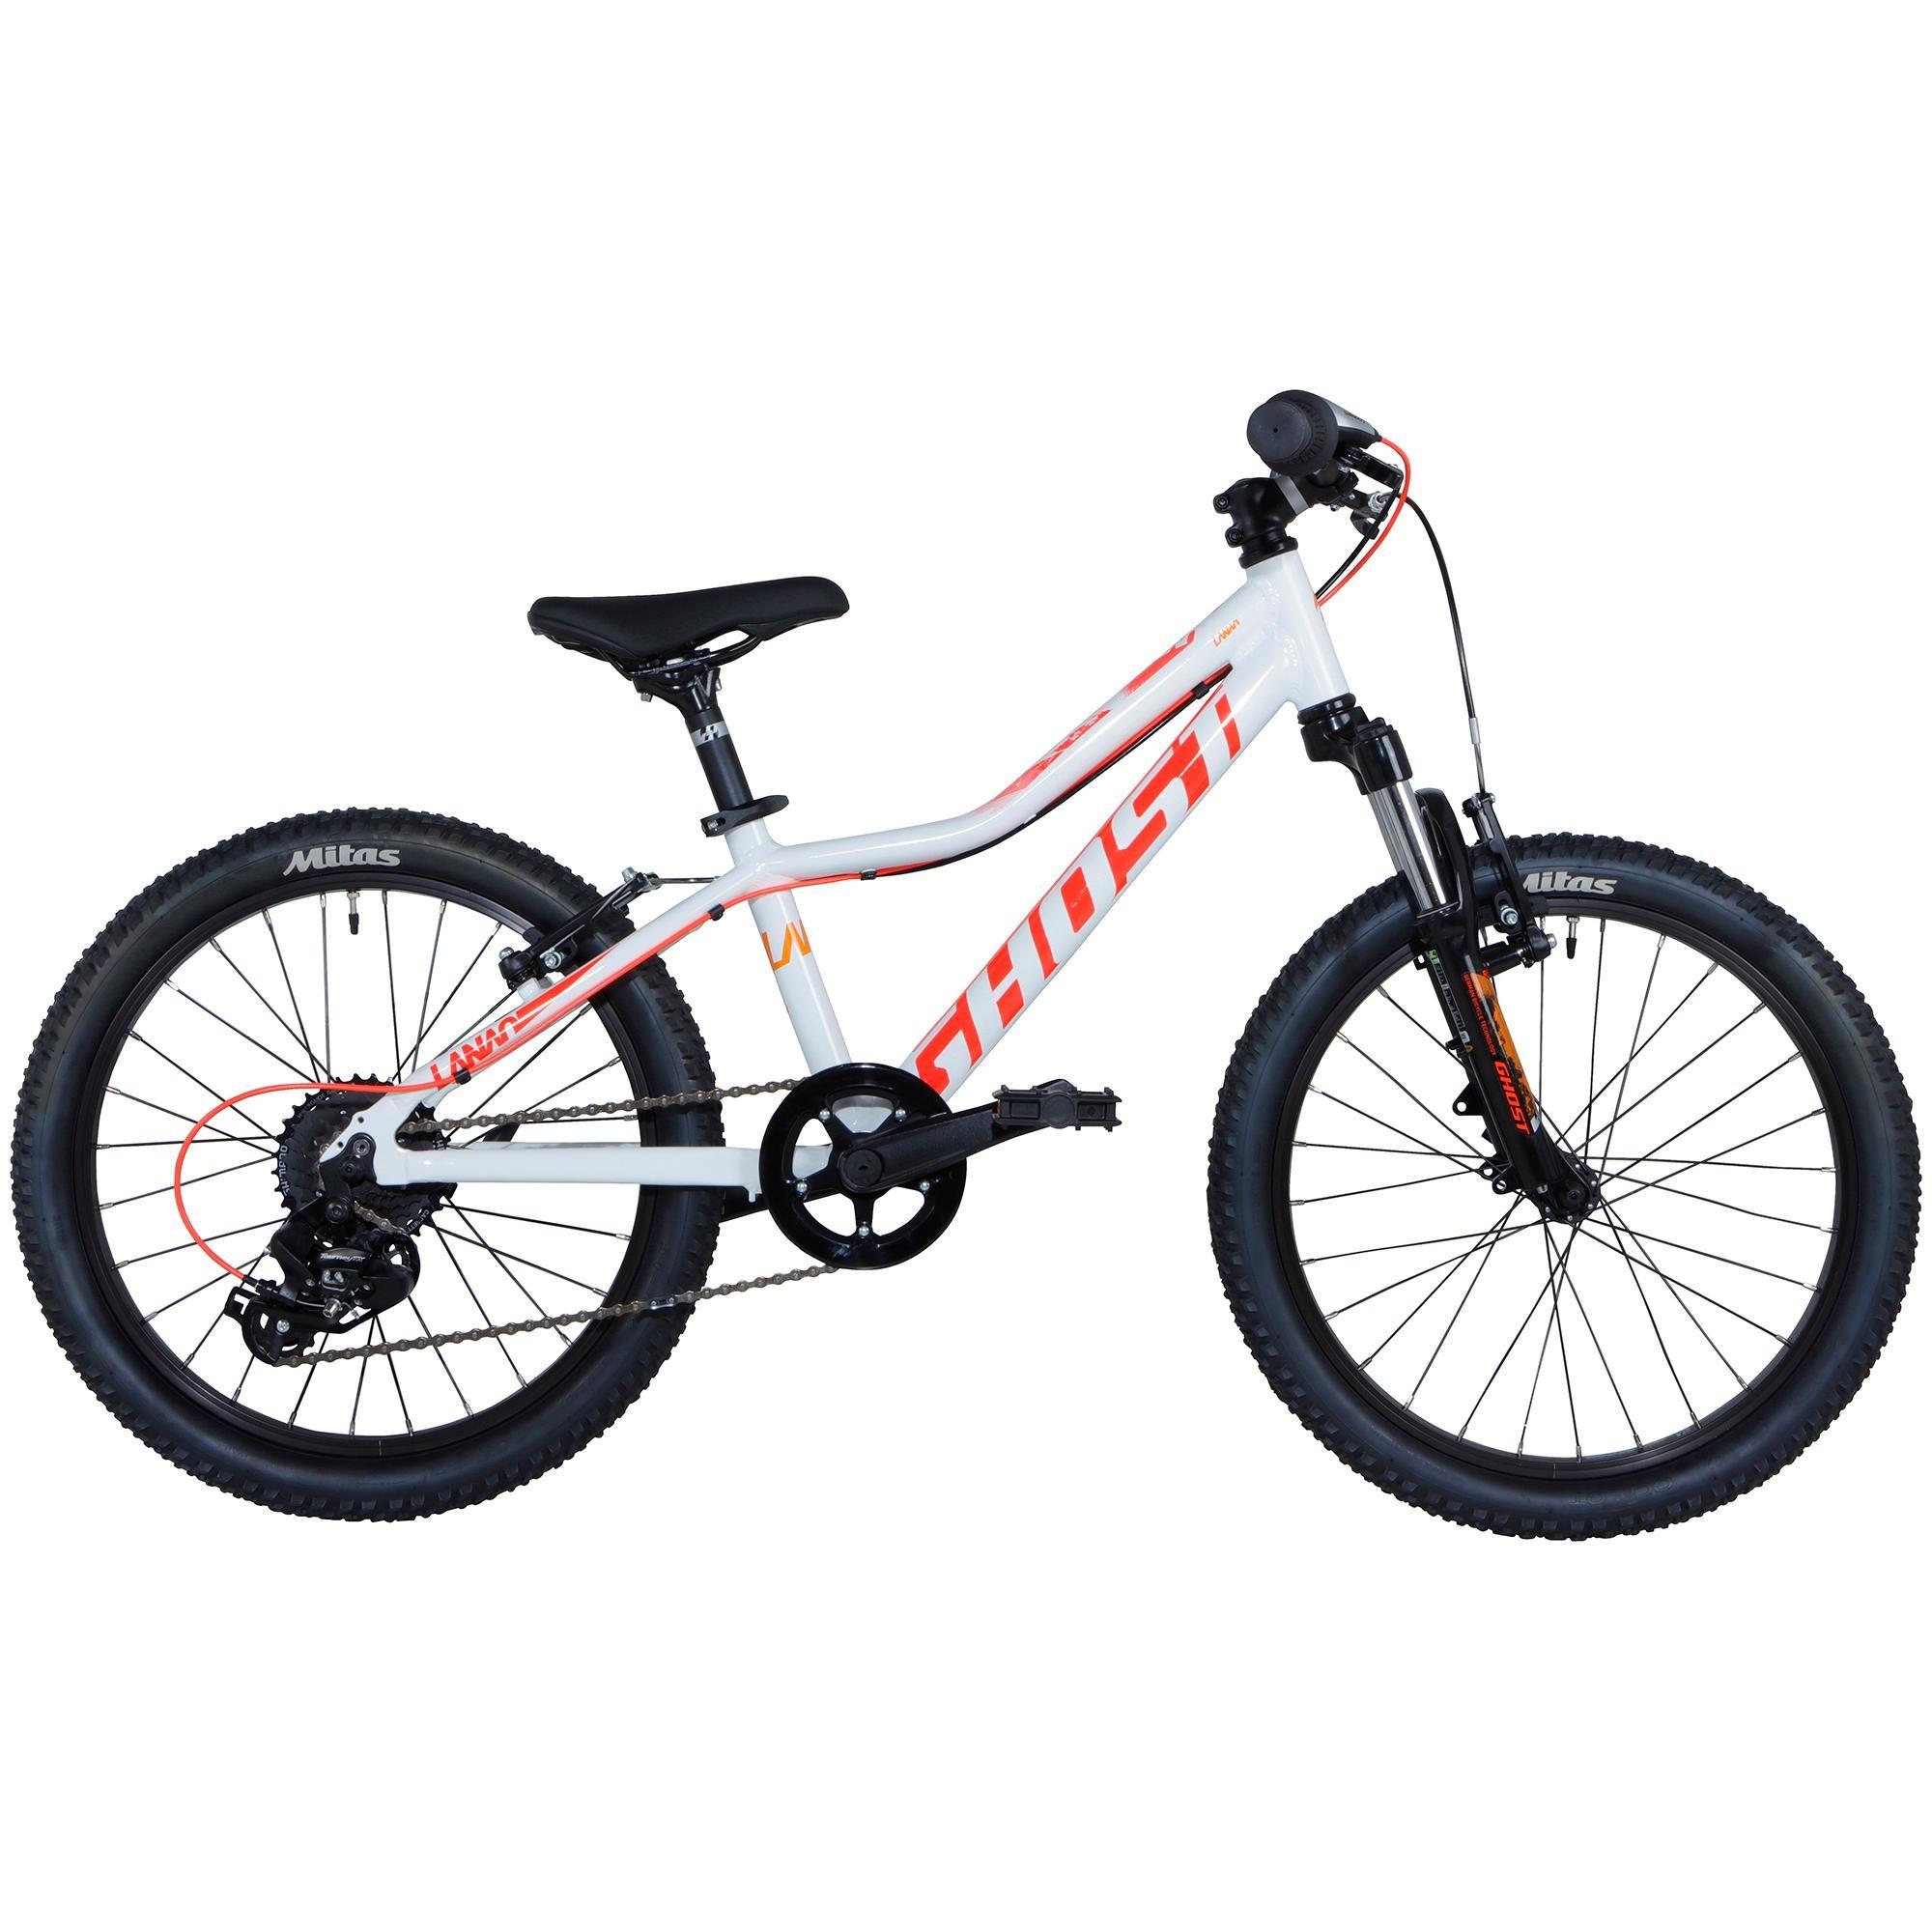 Lanao Kid 2,0 19, mountainbike, børn , Grå | Mountainbikes